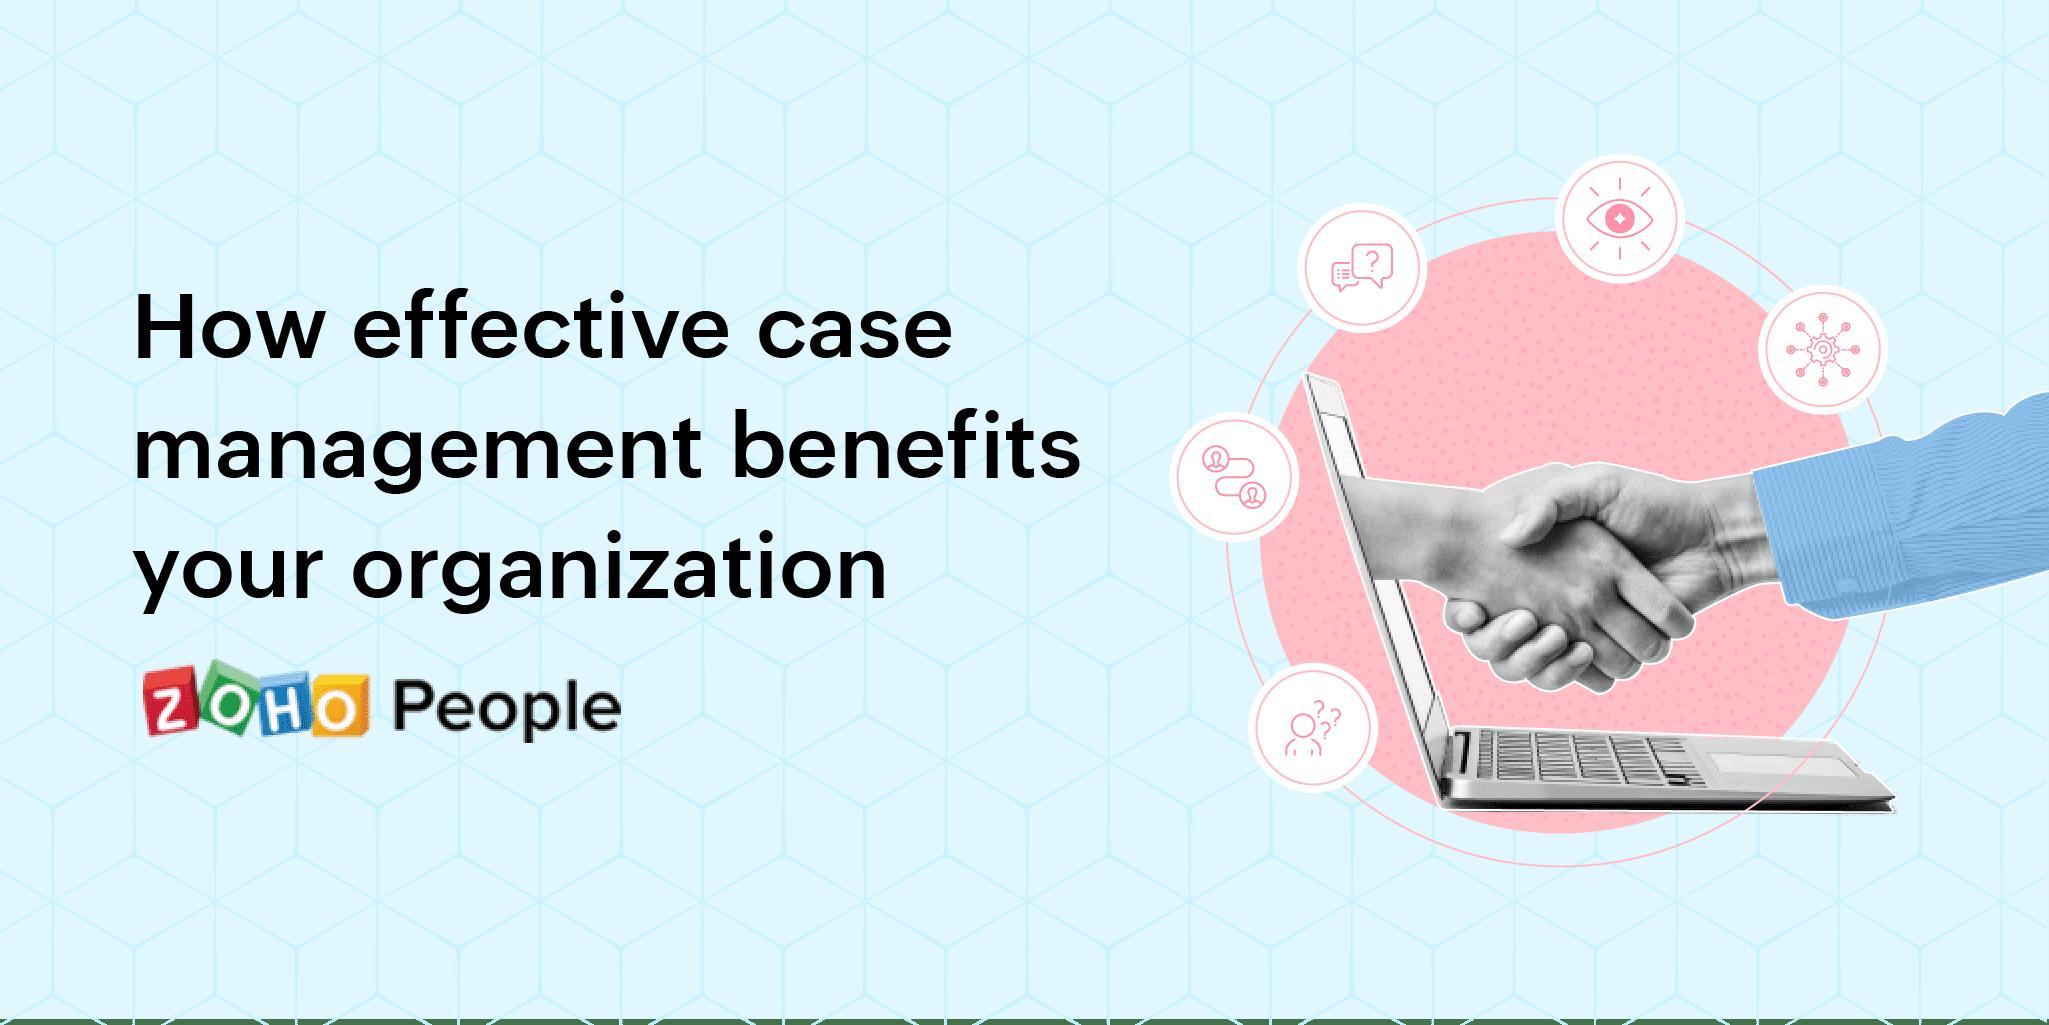 How effective case management benefits organizations